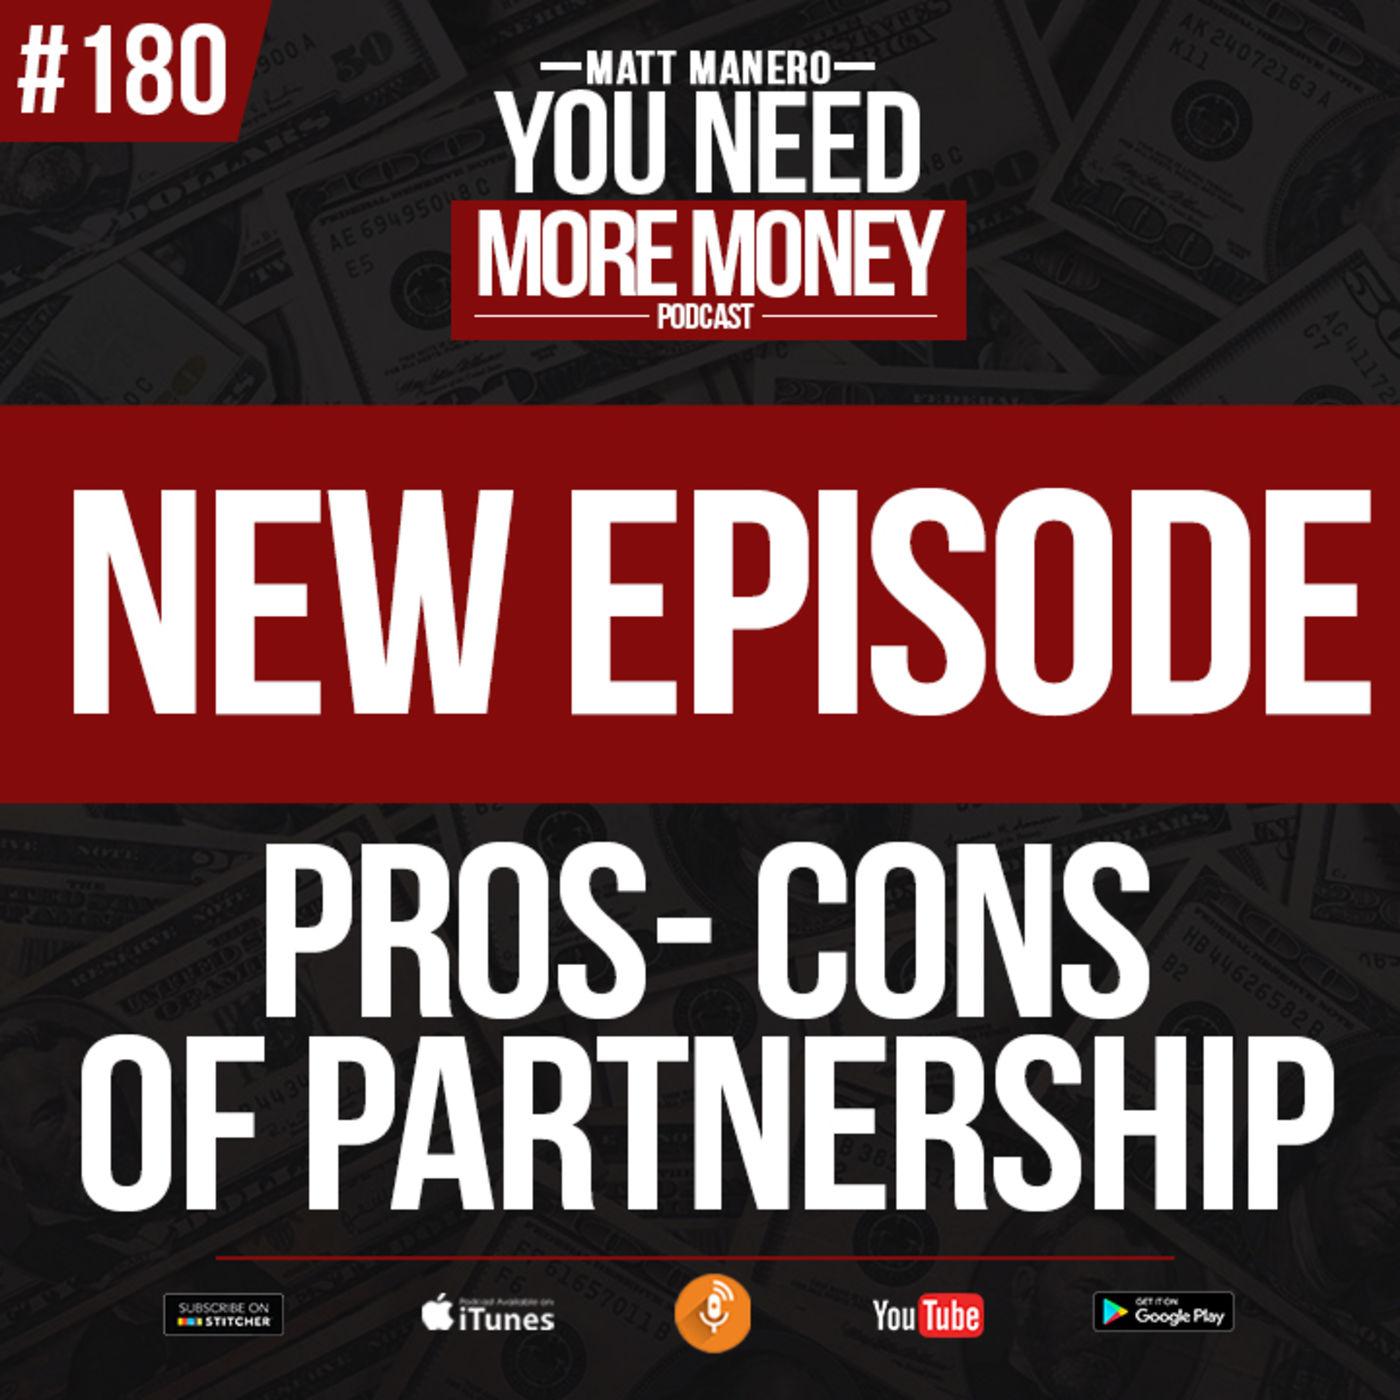 #180 Pros - Cons of Partnership with host Matt Manero